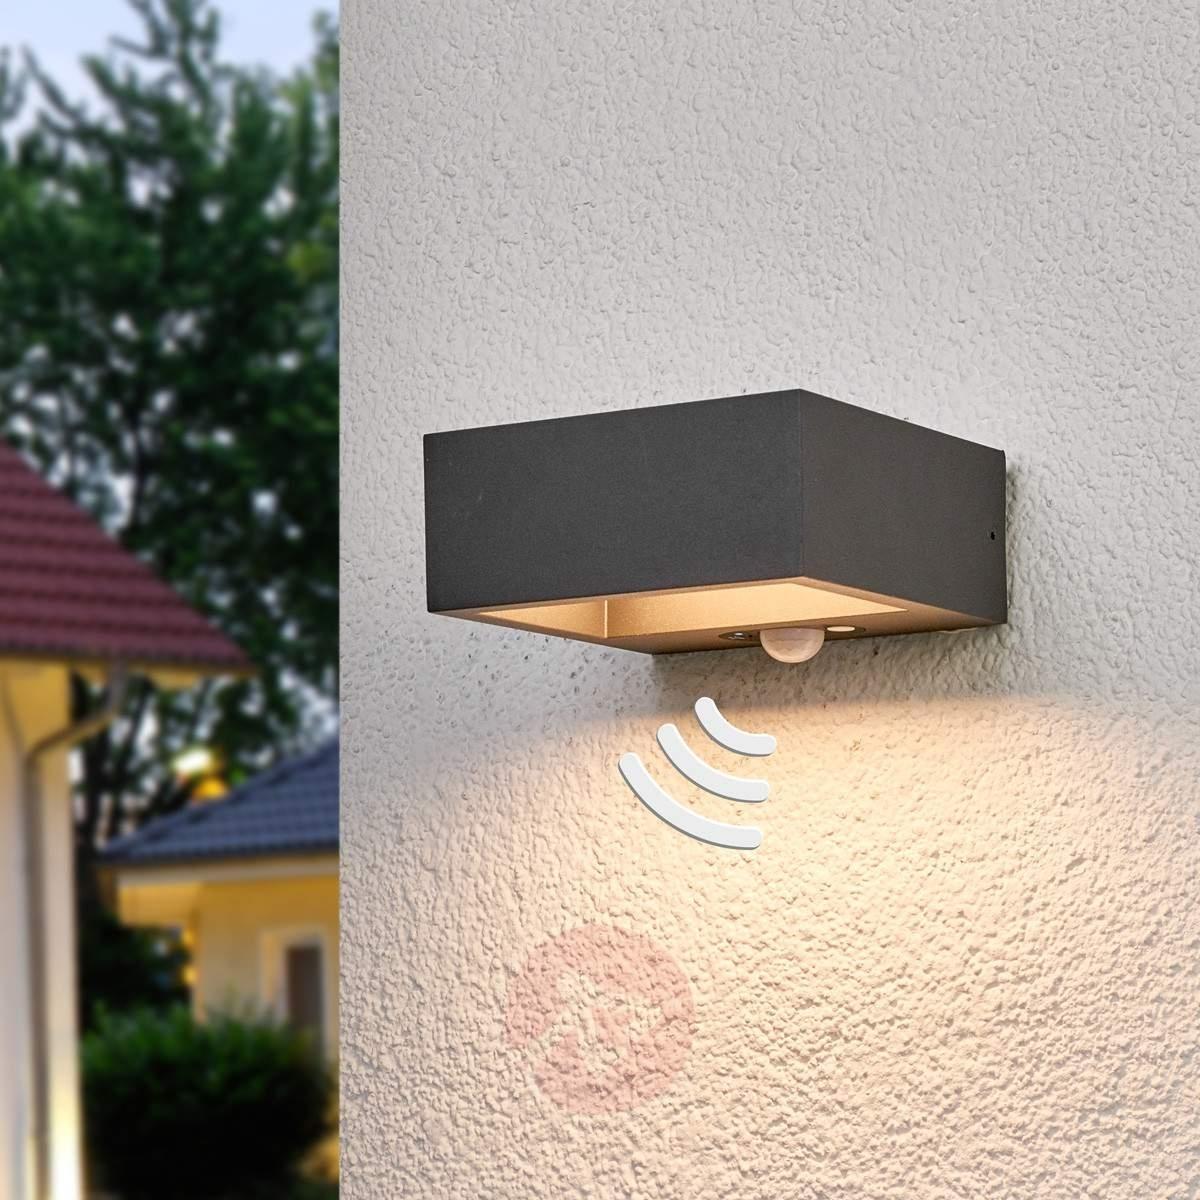 Solar Powered Led Outdoor Wall Light Mahra, Sensor | Lights (View 4 of 15)